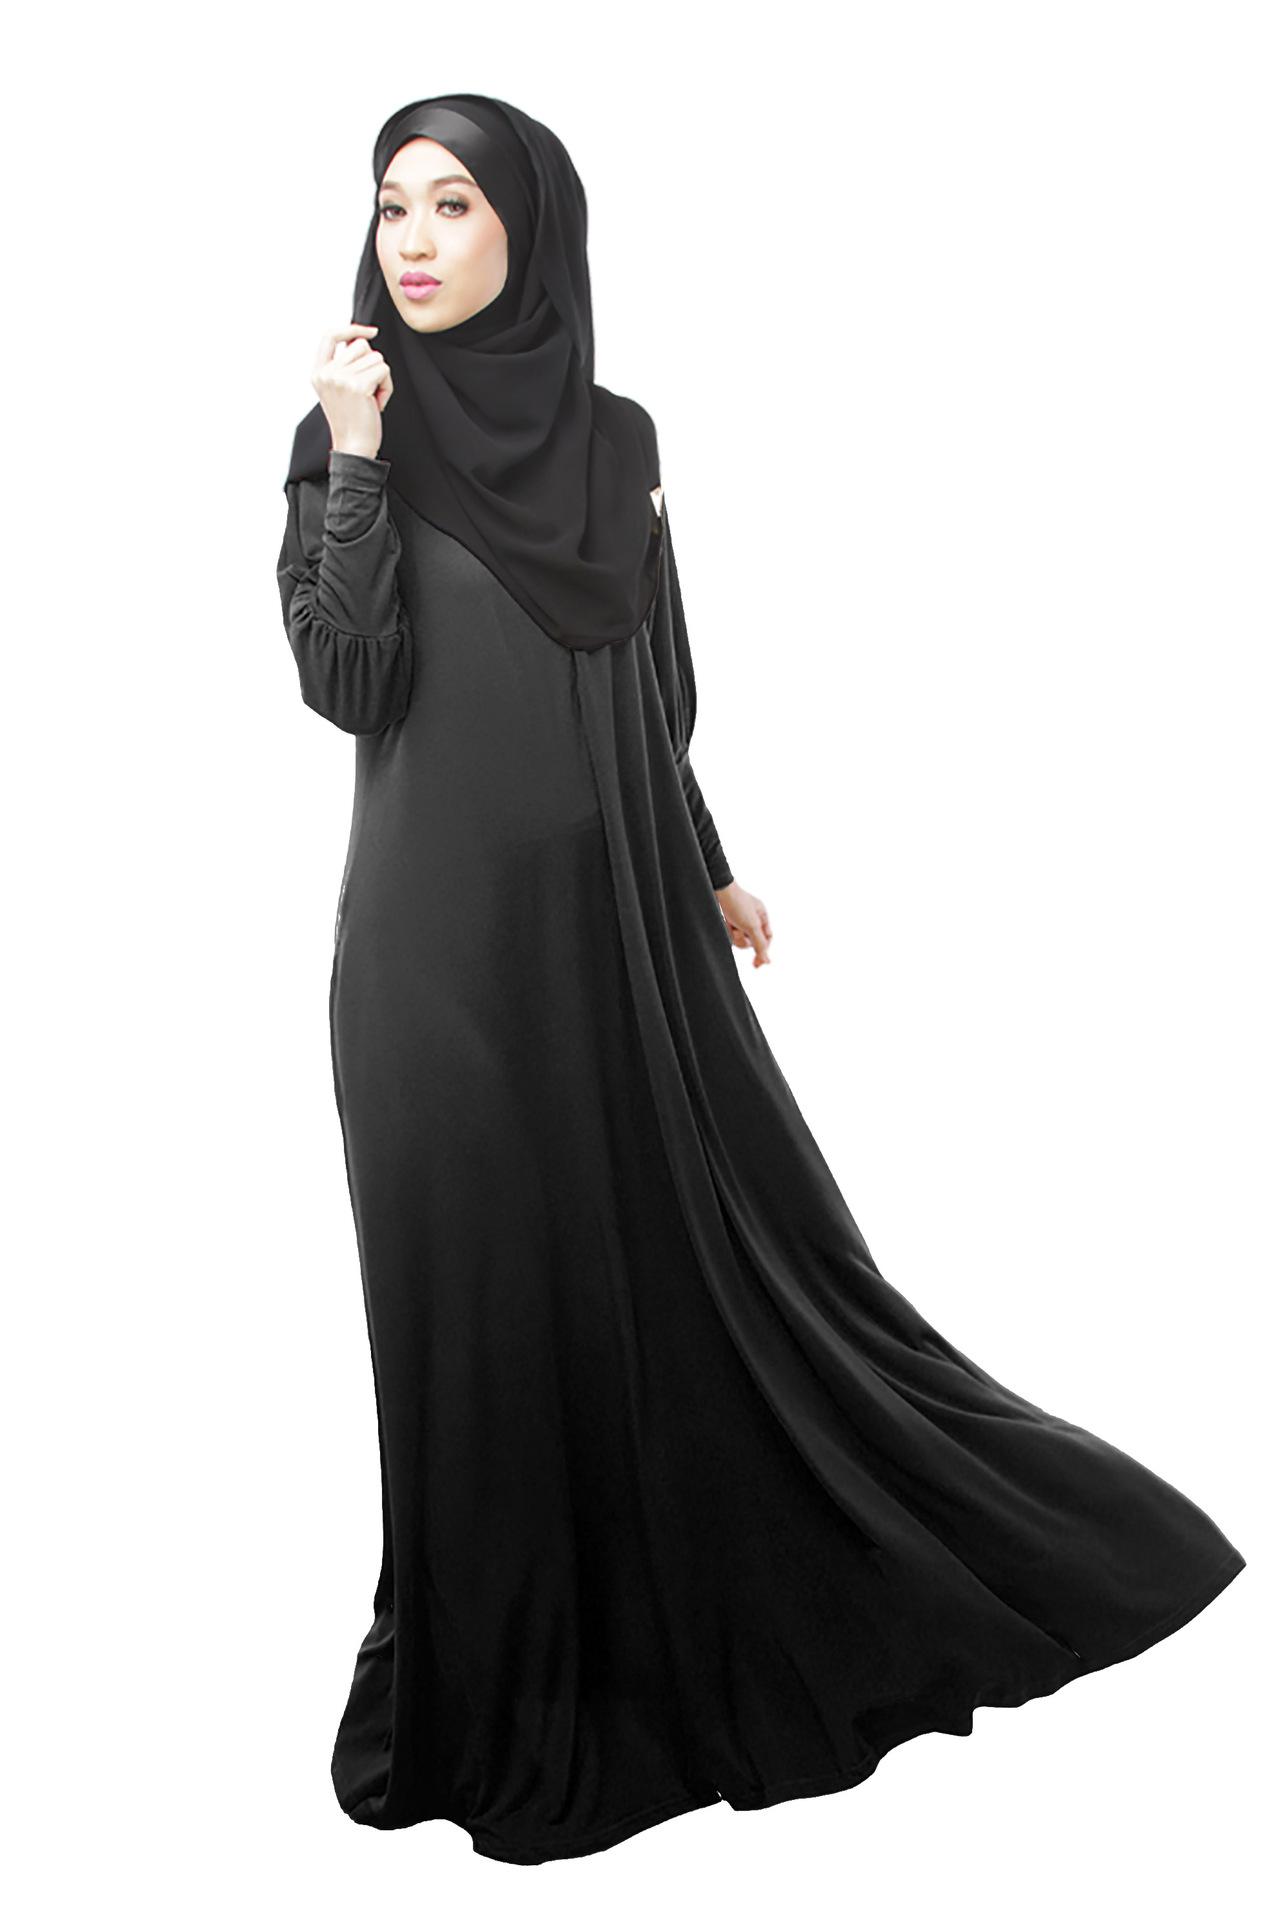 Islamic cloth for women